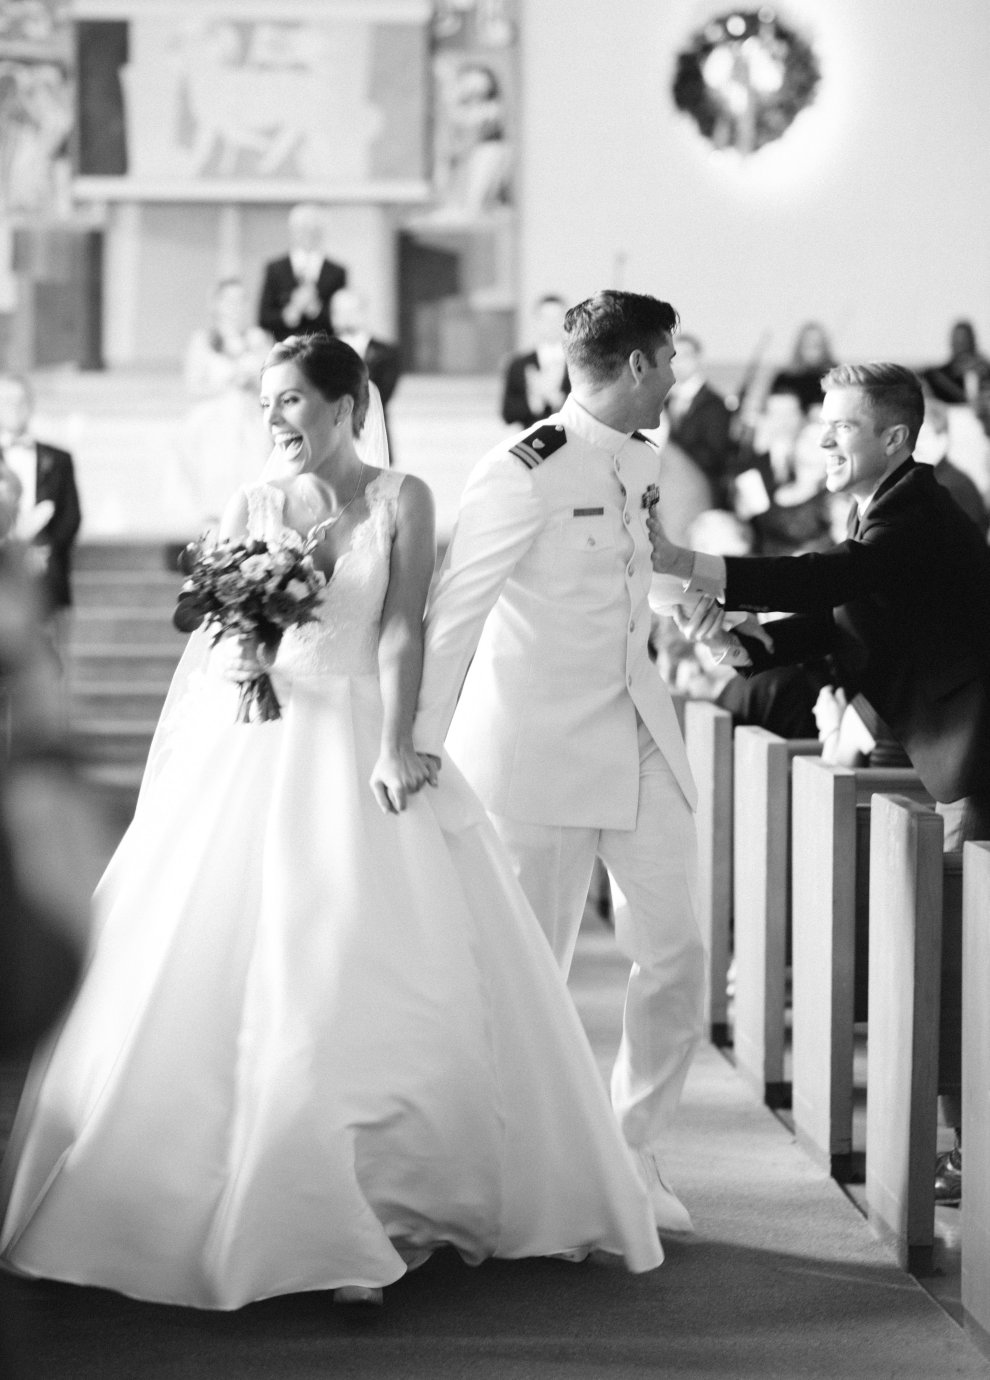 View More: http://abbygracephotography.pass.us/leyko-wedding